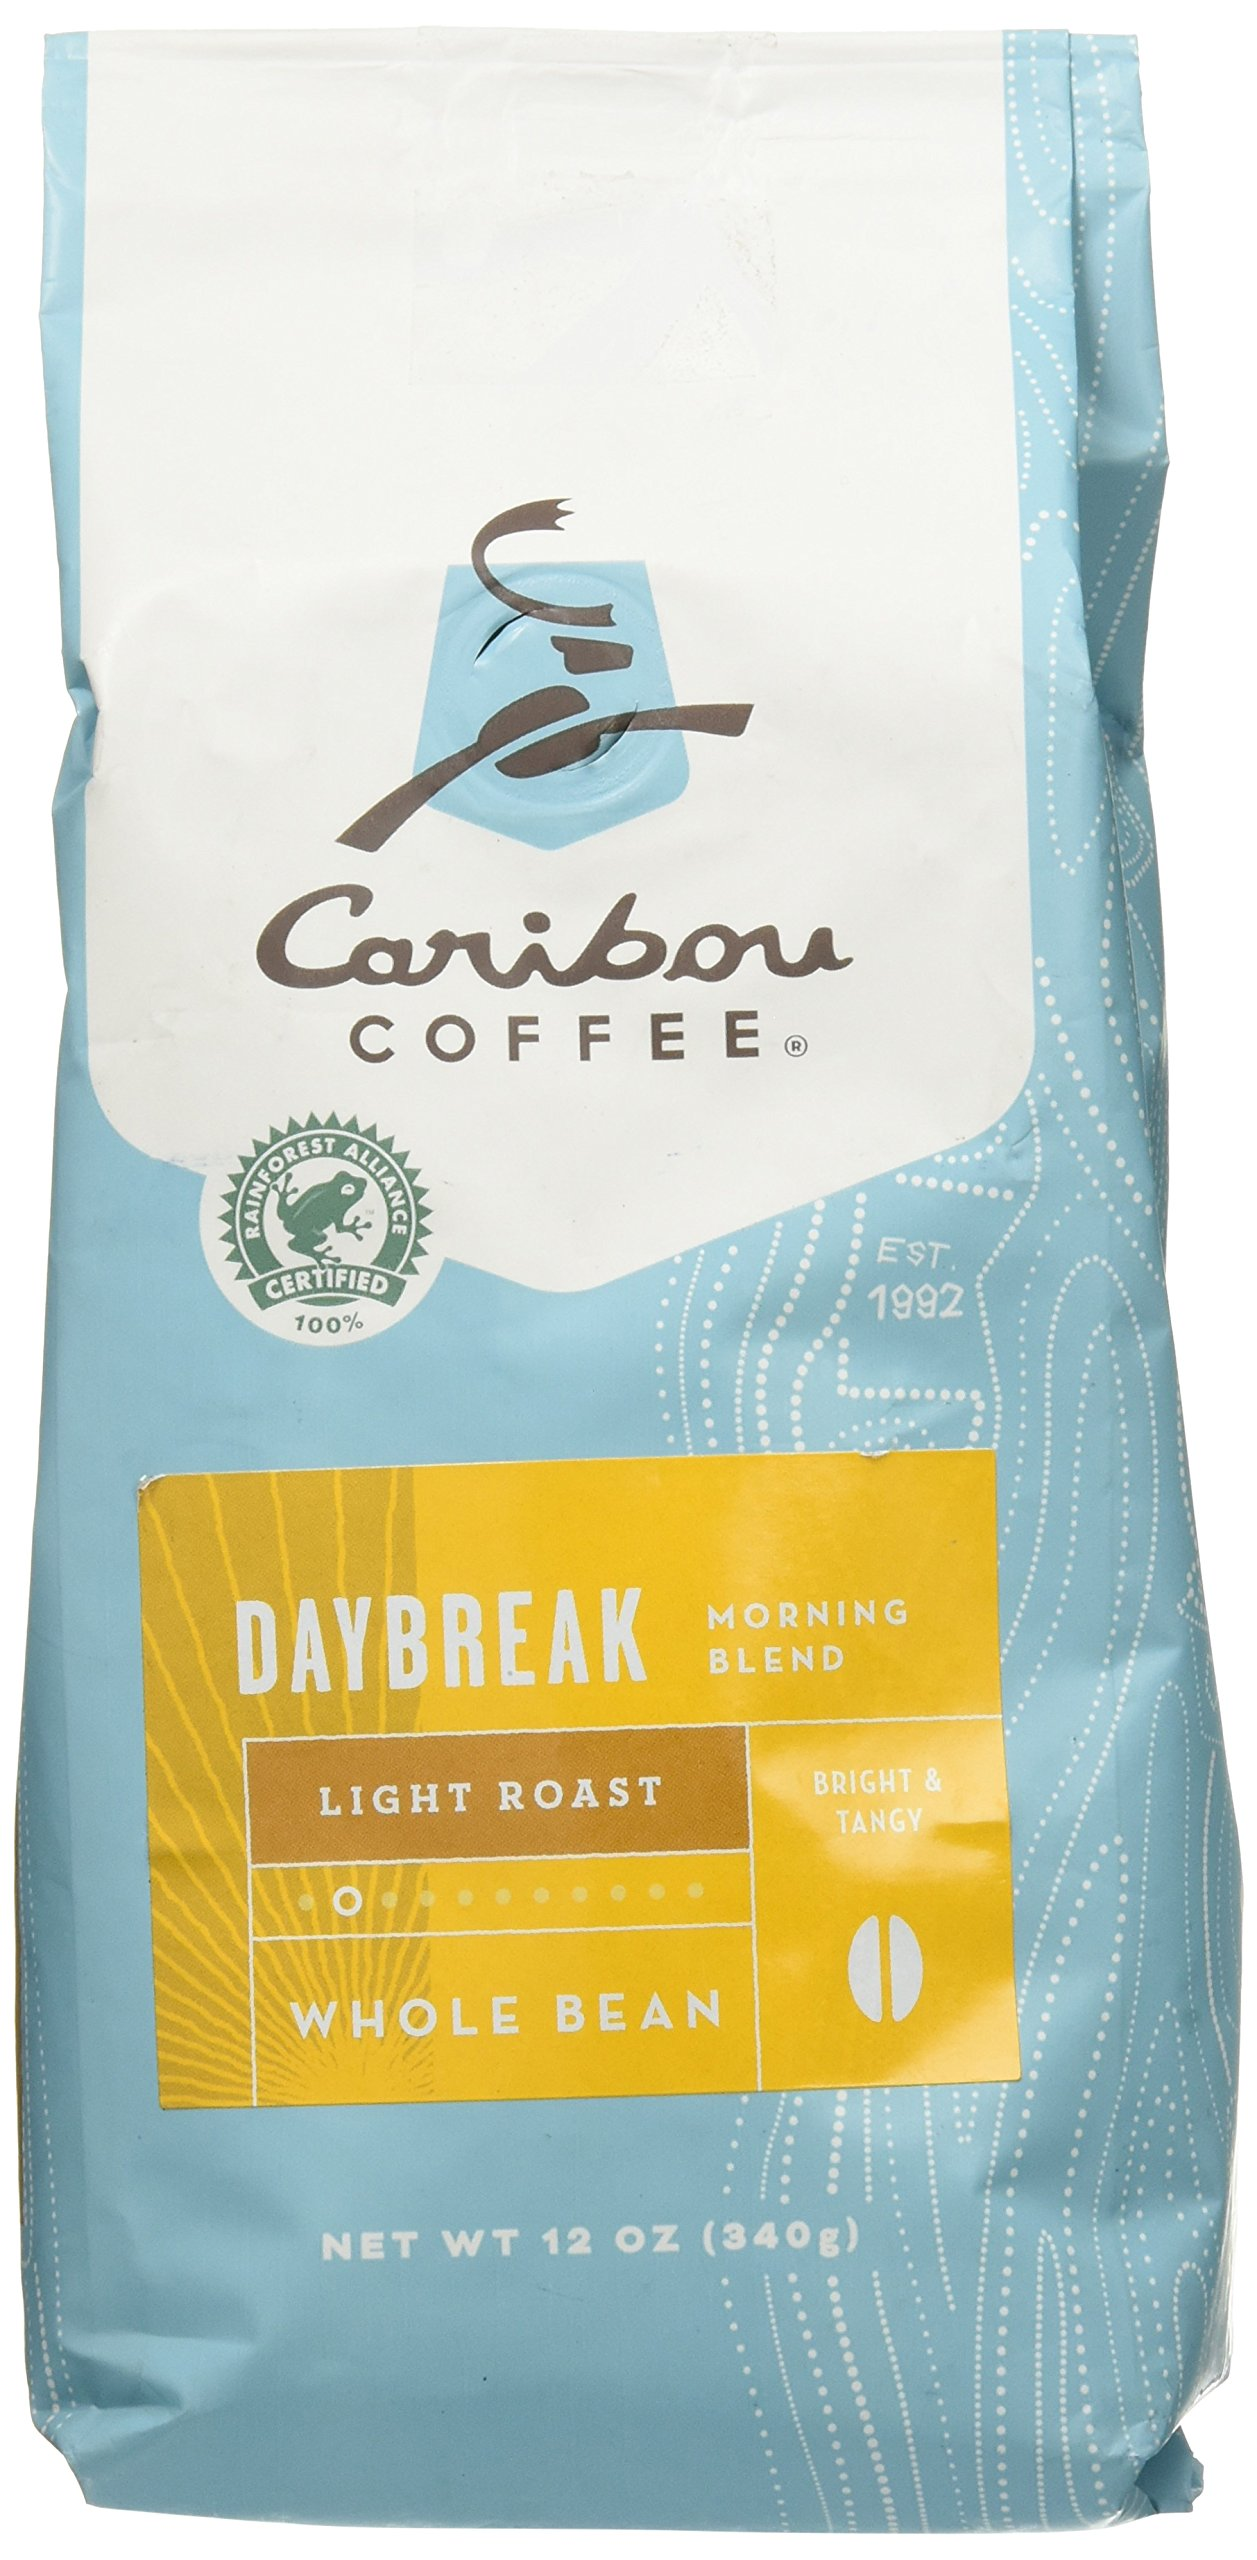 Caribou Daybreak Morning Blend Light Roast Coffee